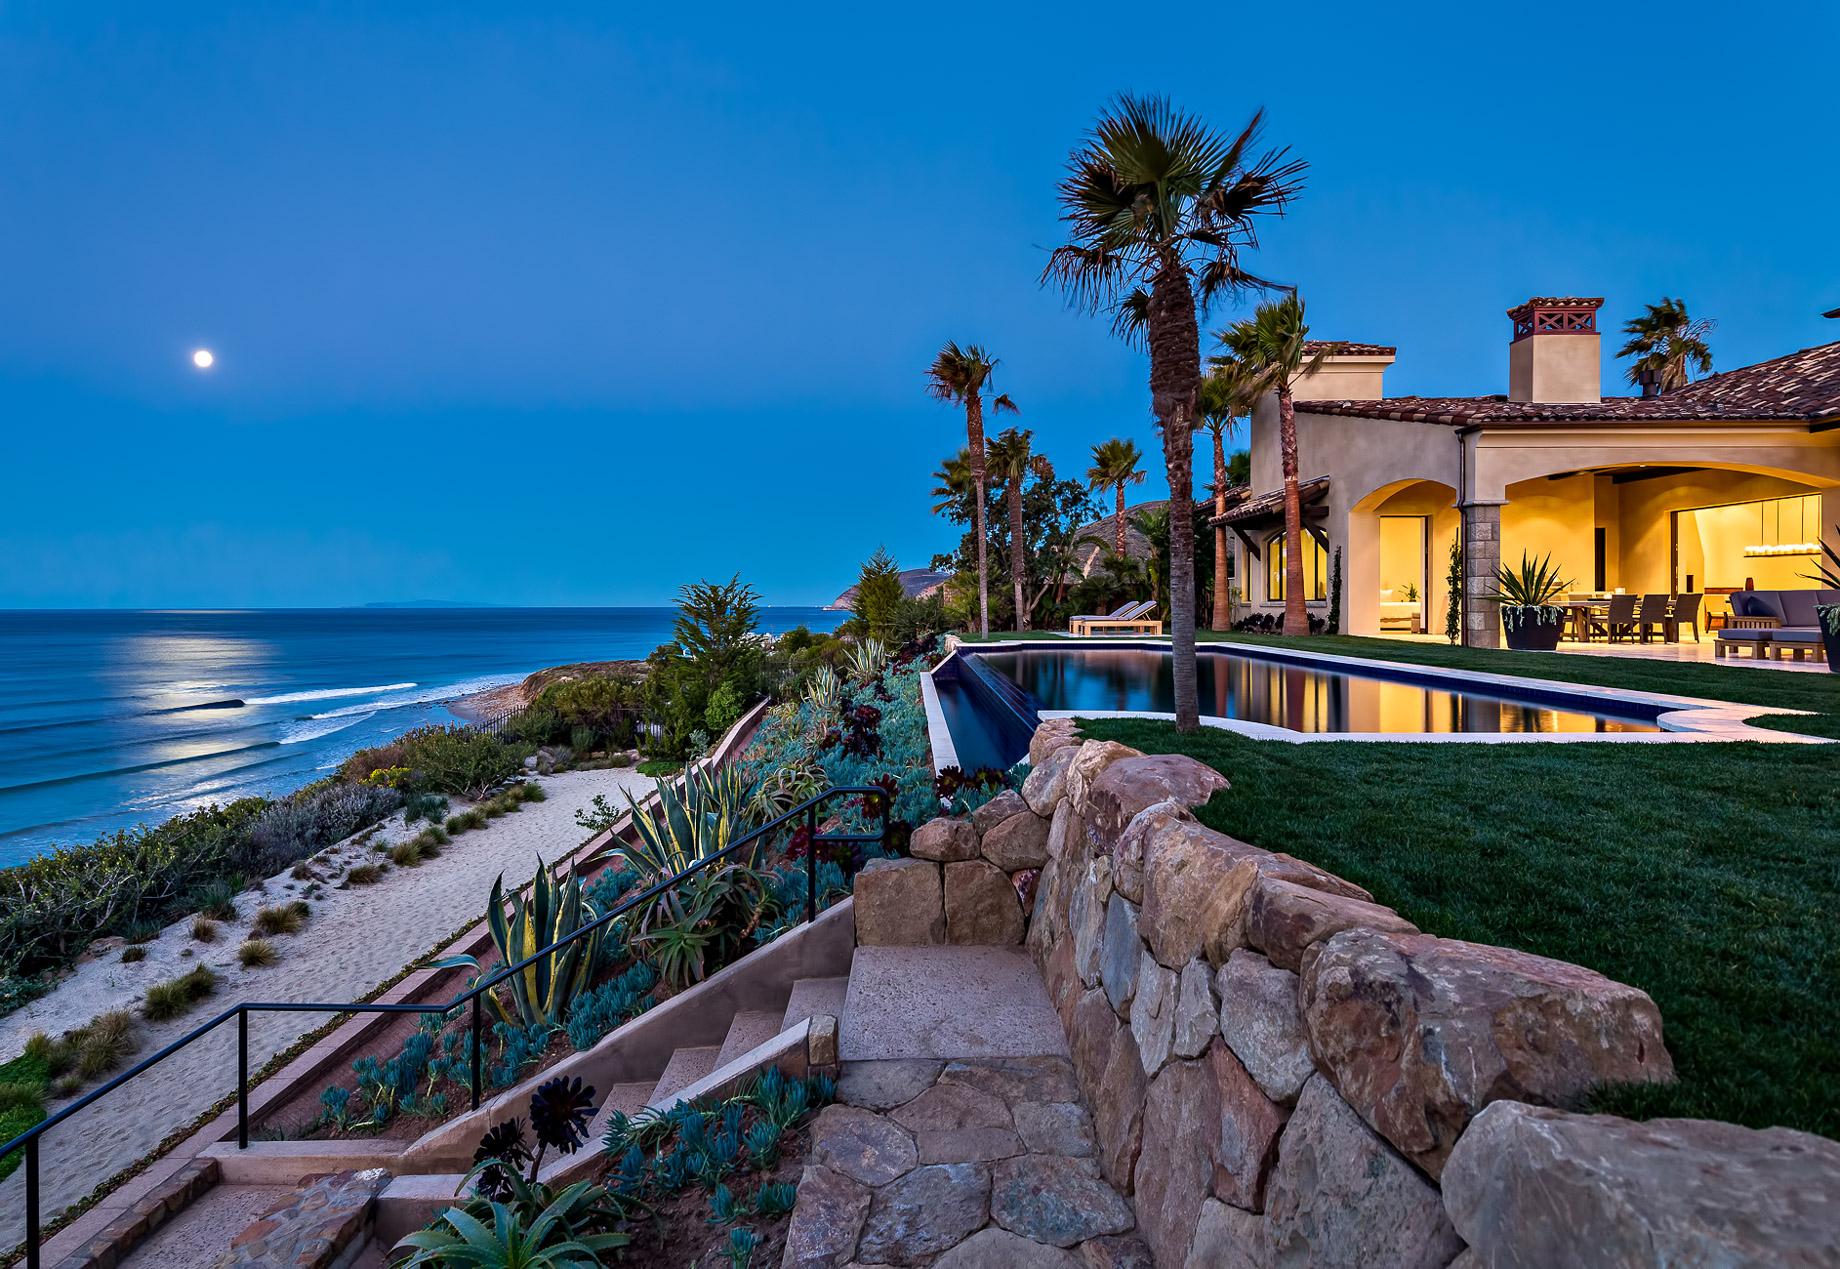 Marisol Spanish Estate - 11768 Ellice St, Malibu, CA, USA